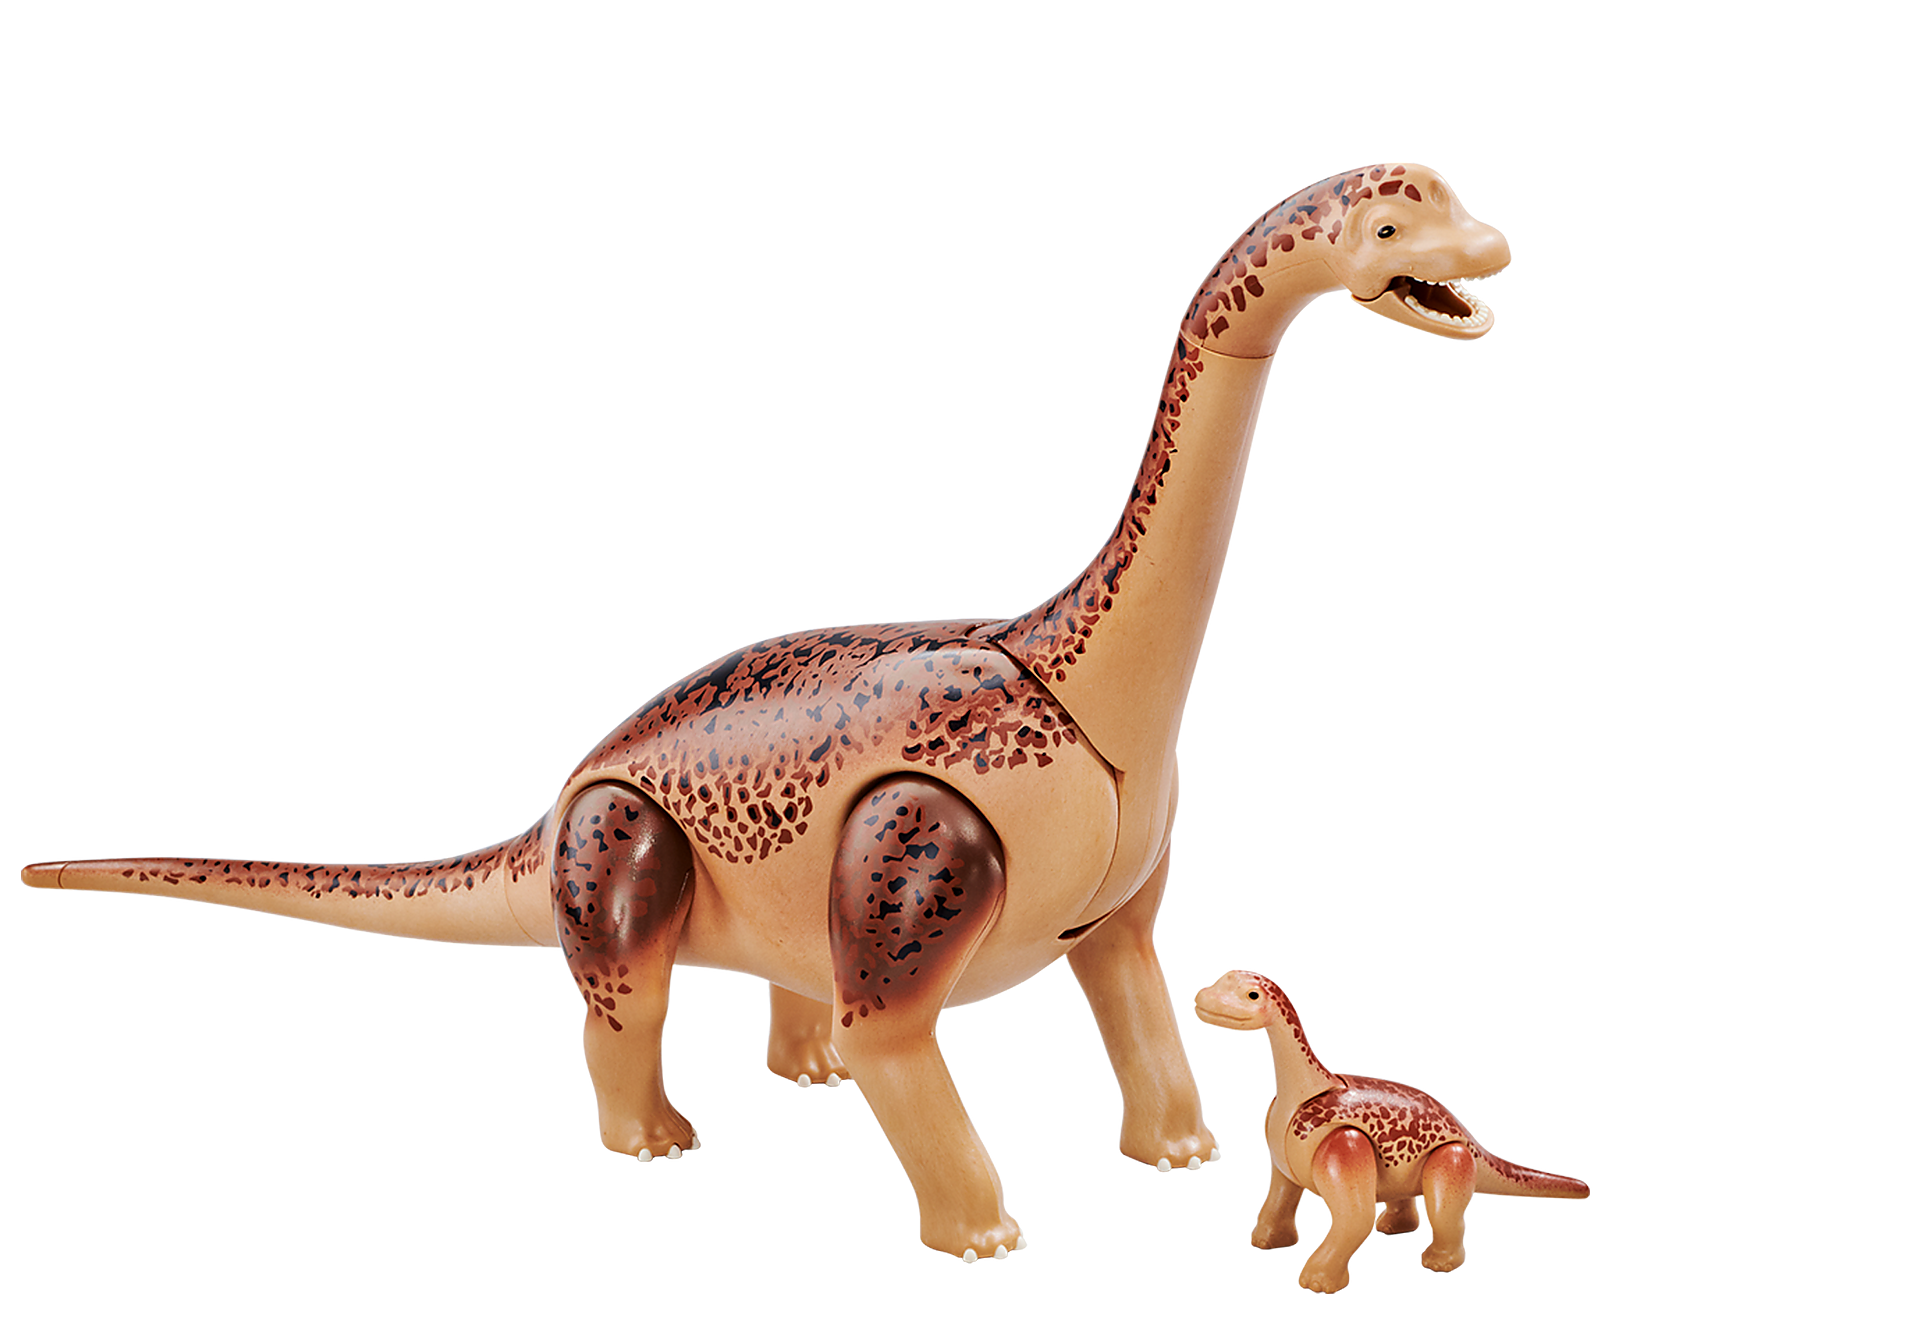 http://media.playmobil.com/i/playmobil/6595_product_detail/Brachiozaur z młodym dinozaurem